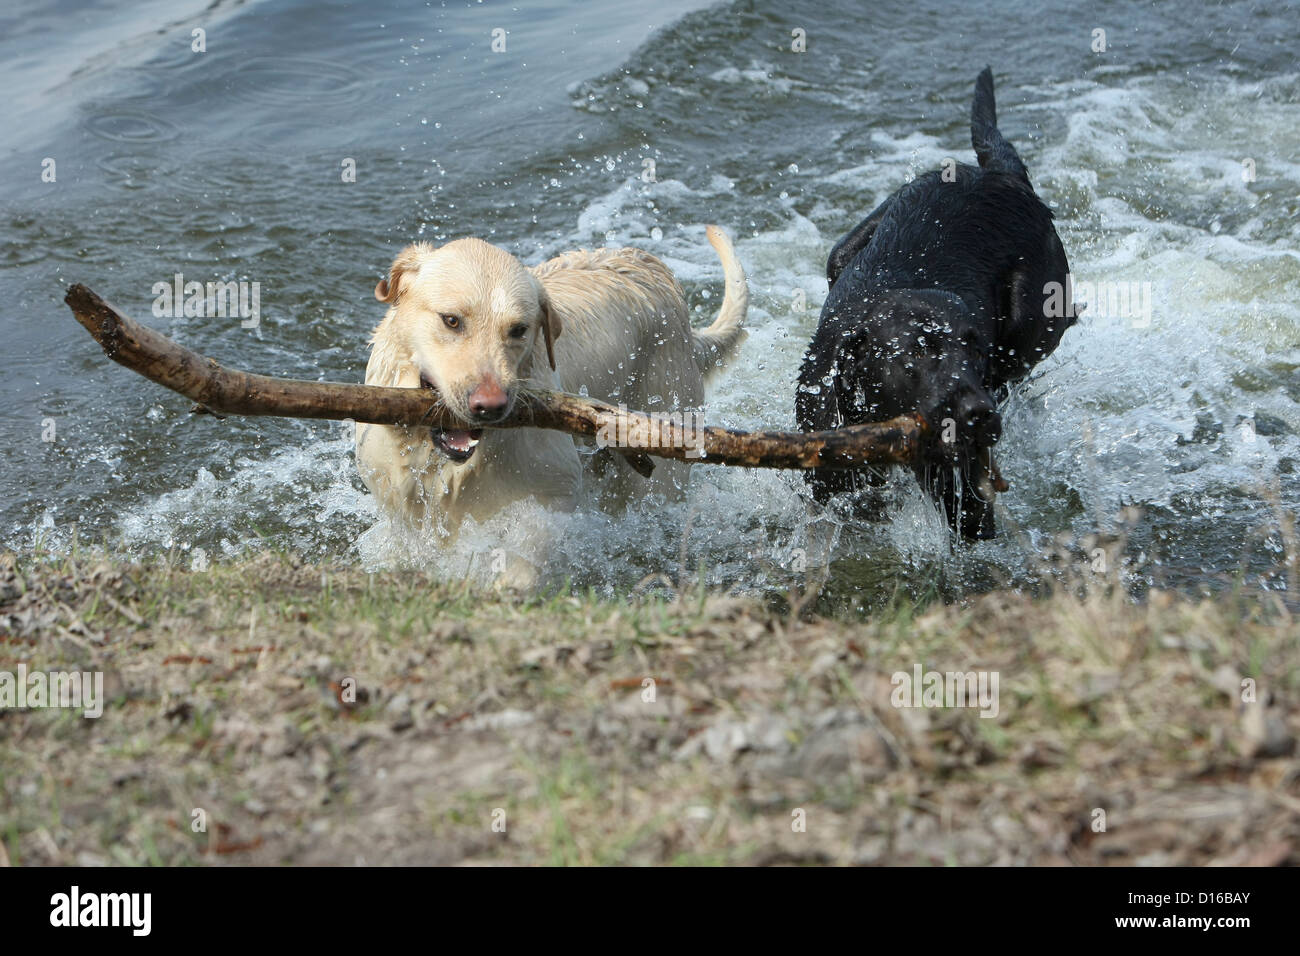 Playing dogs, Canis lupus familiaris, Feldberg, Feldberger Seenlandschaft, Mecklenburg-Vorpommern, Germany - Stock Image